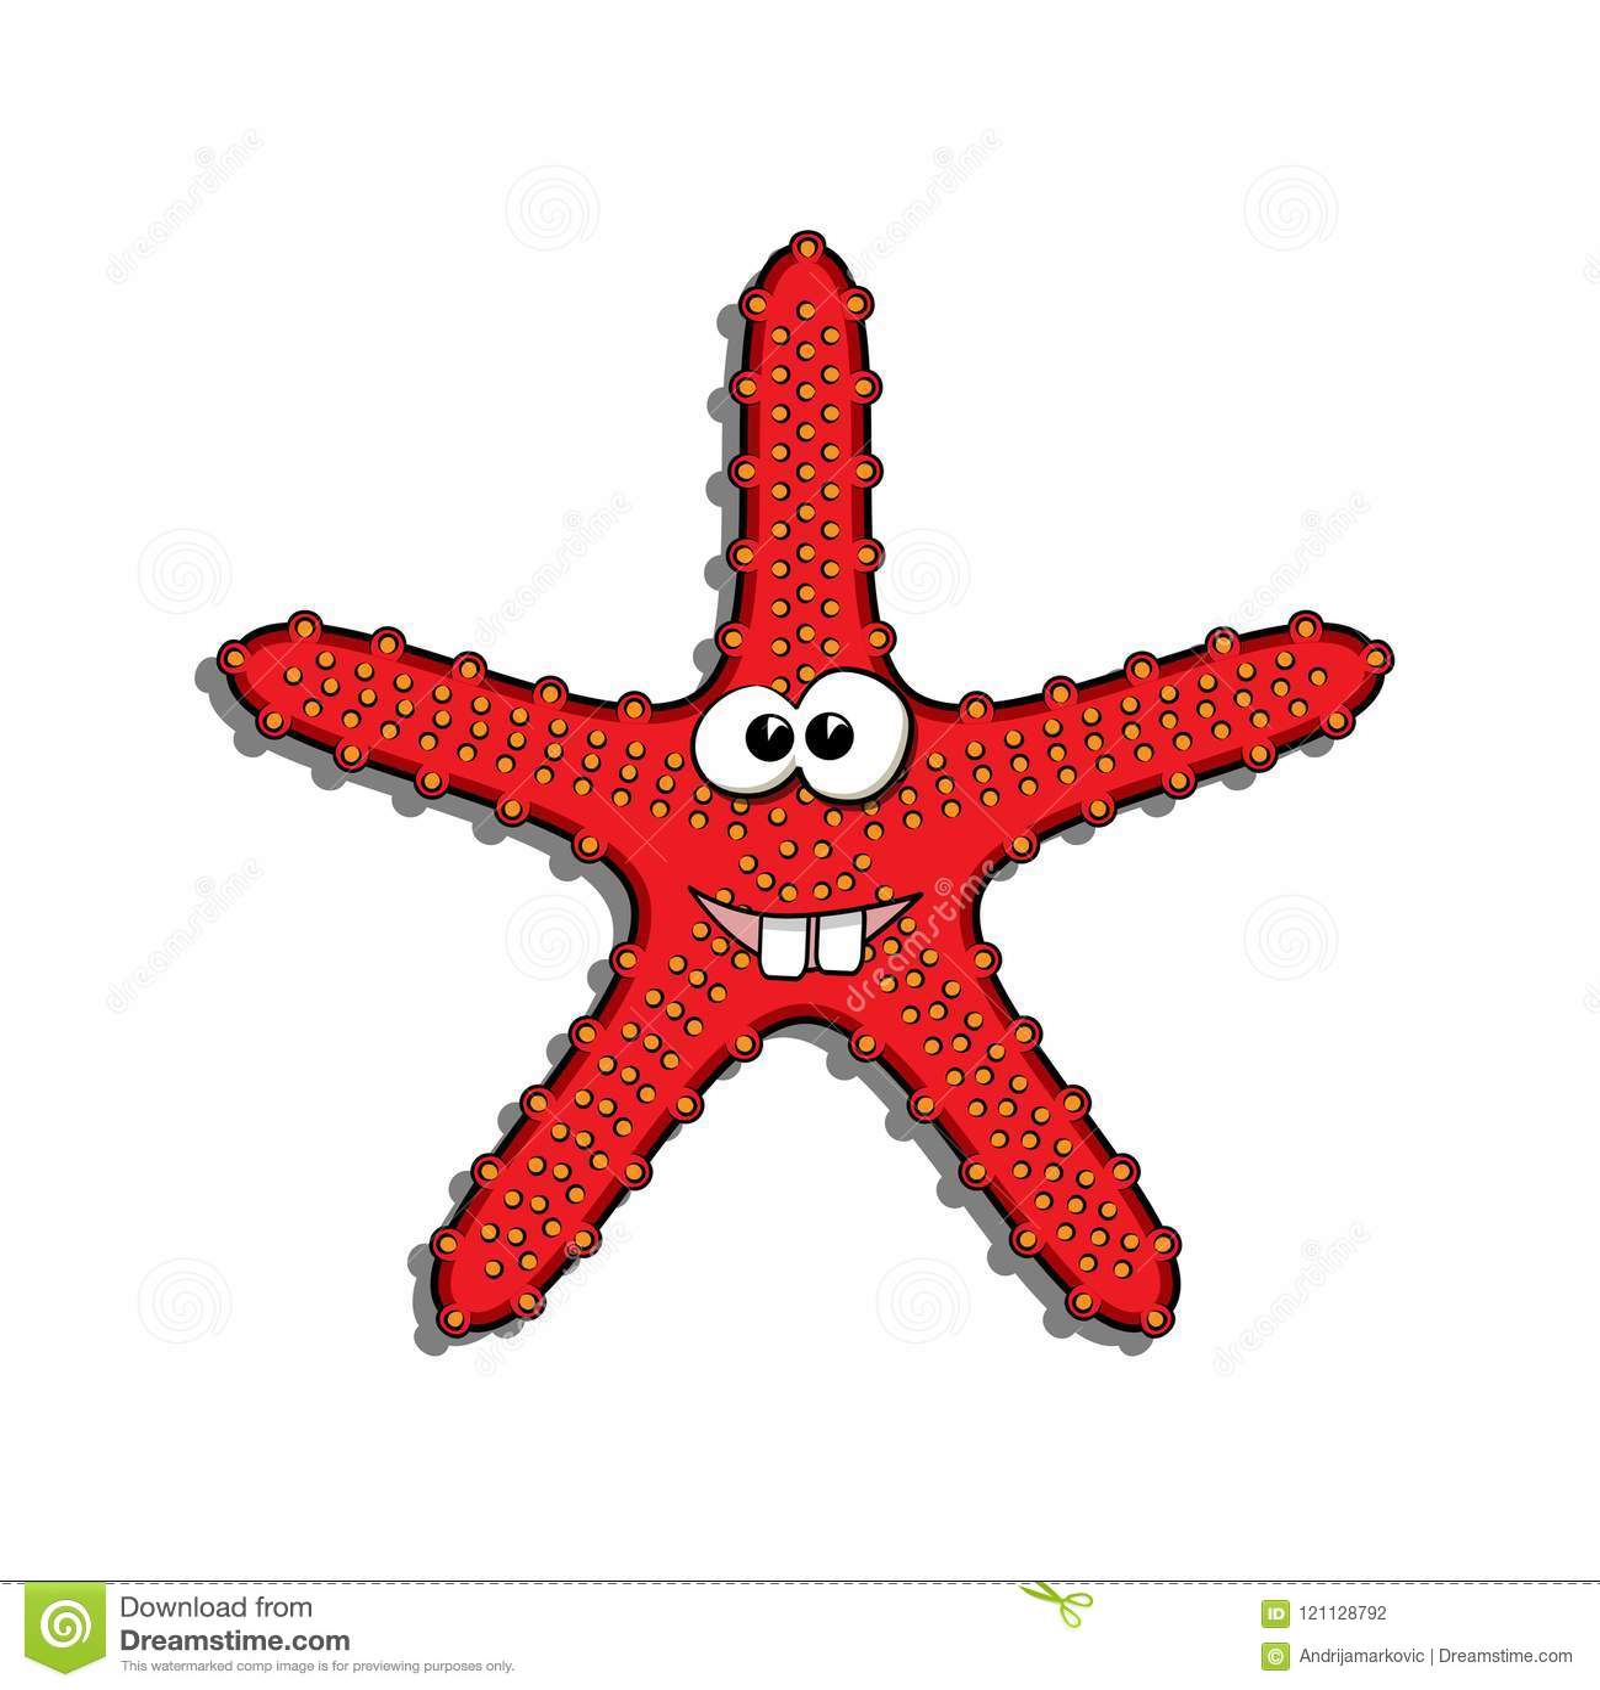 Red Sea Star Cartoon Stock Illustrations – 514 Red Sea Star Cartoon ...